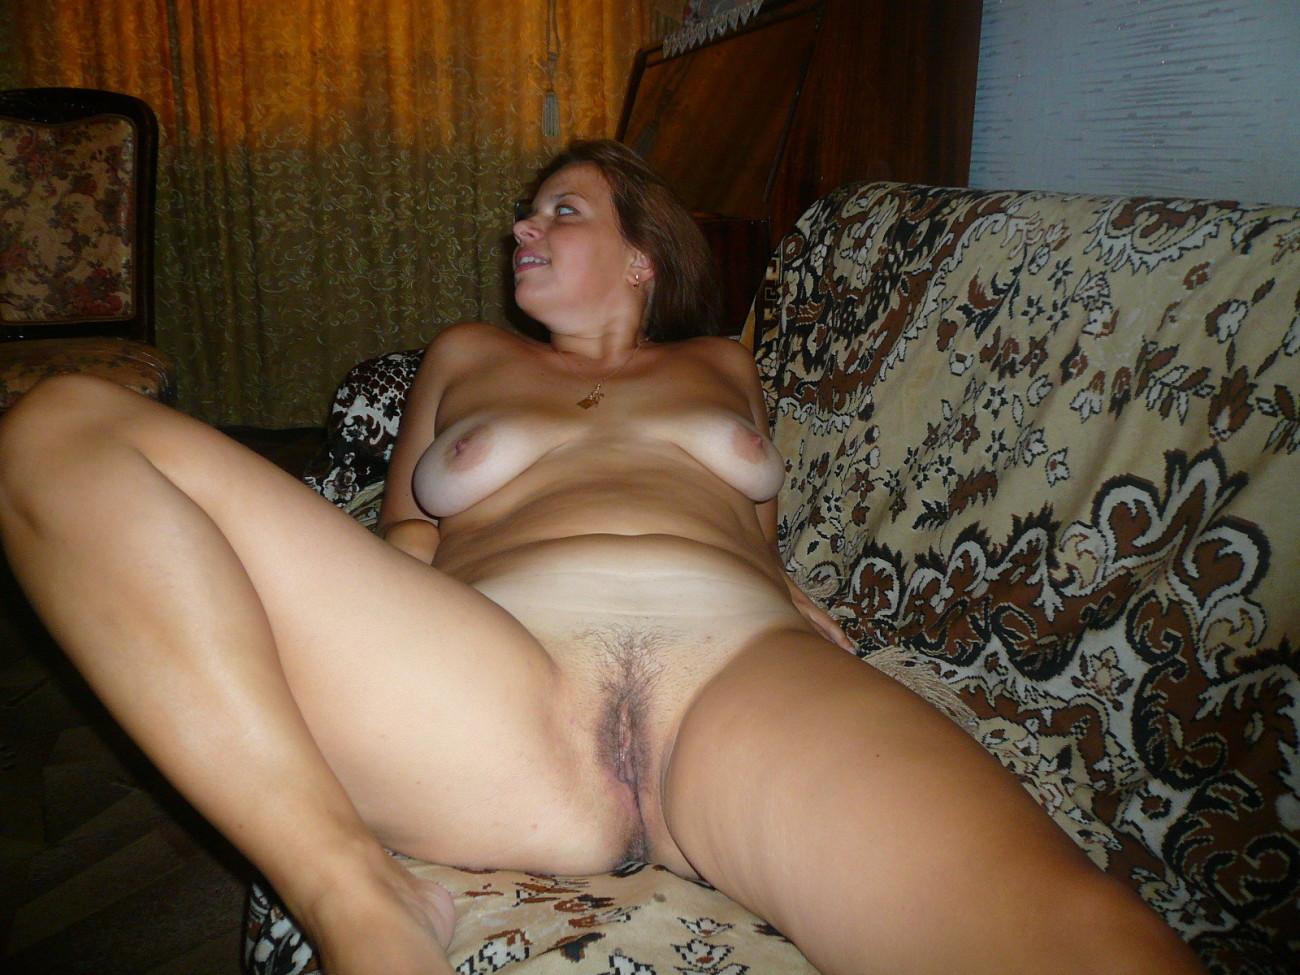 mature wifey Natasha naked and toying..